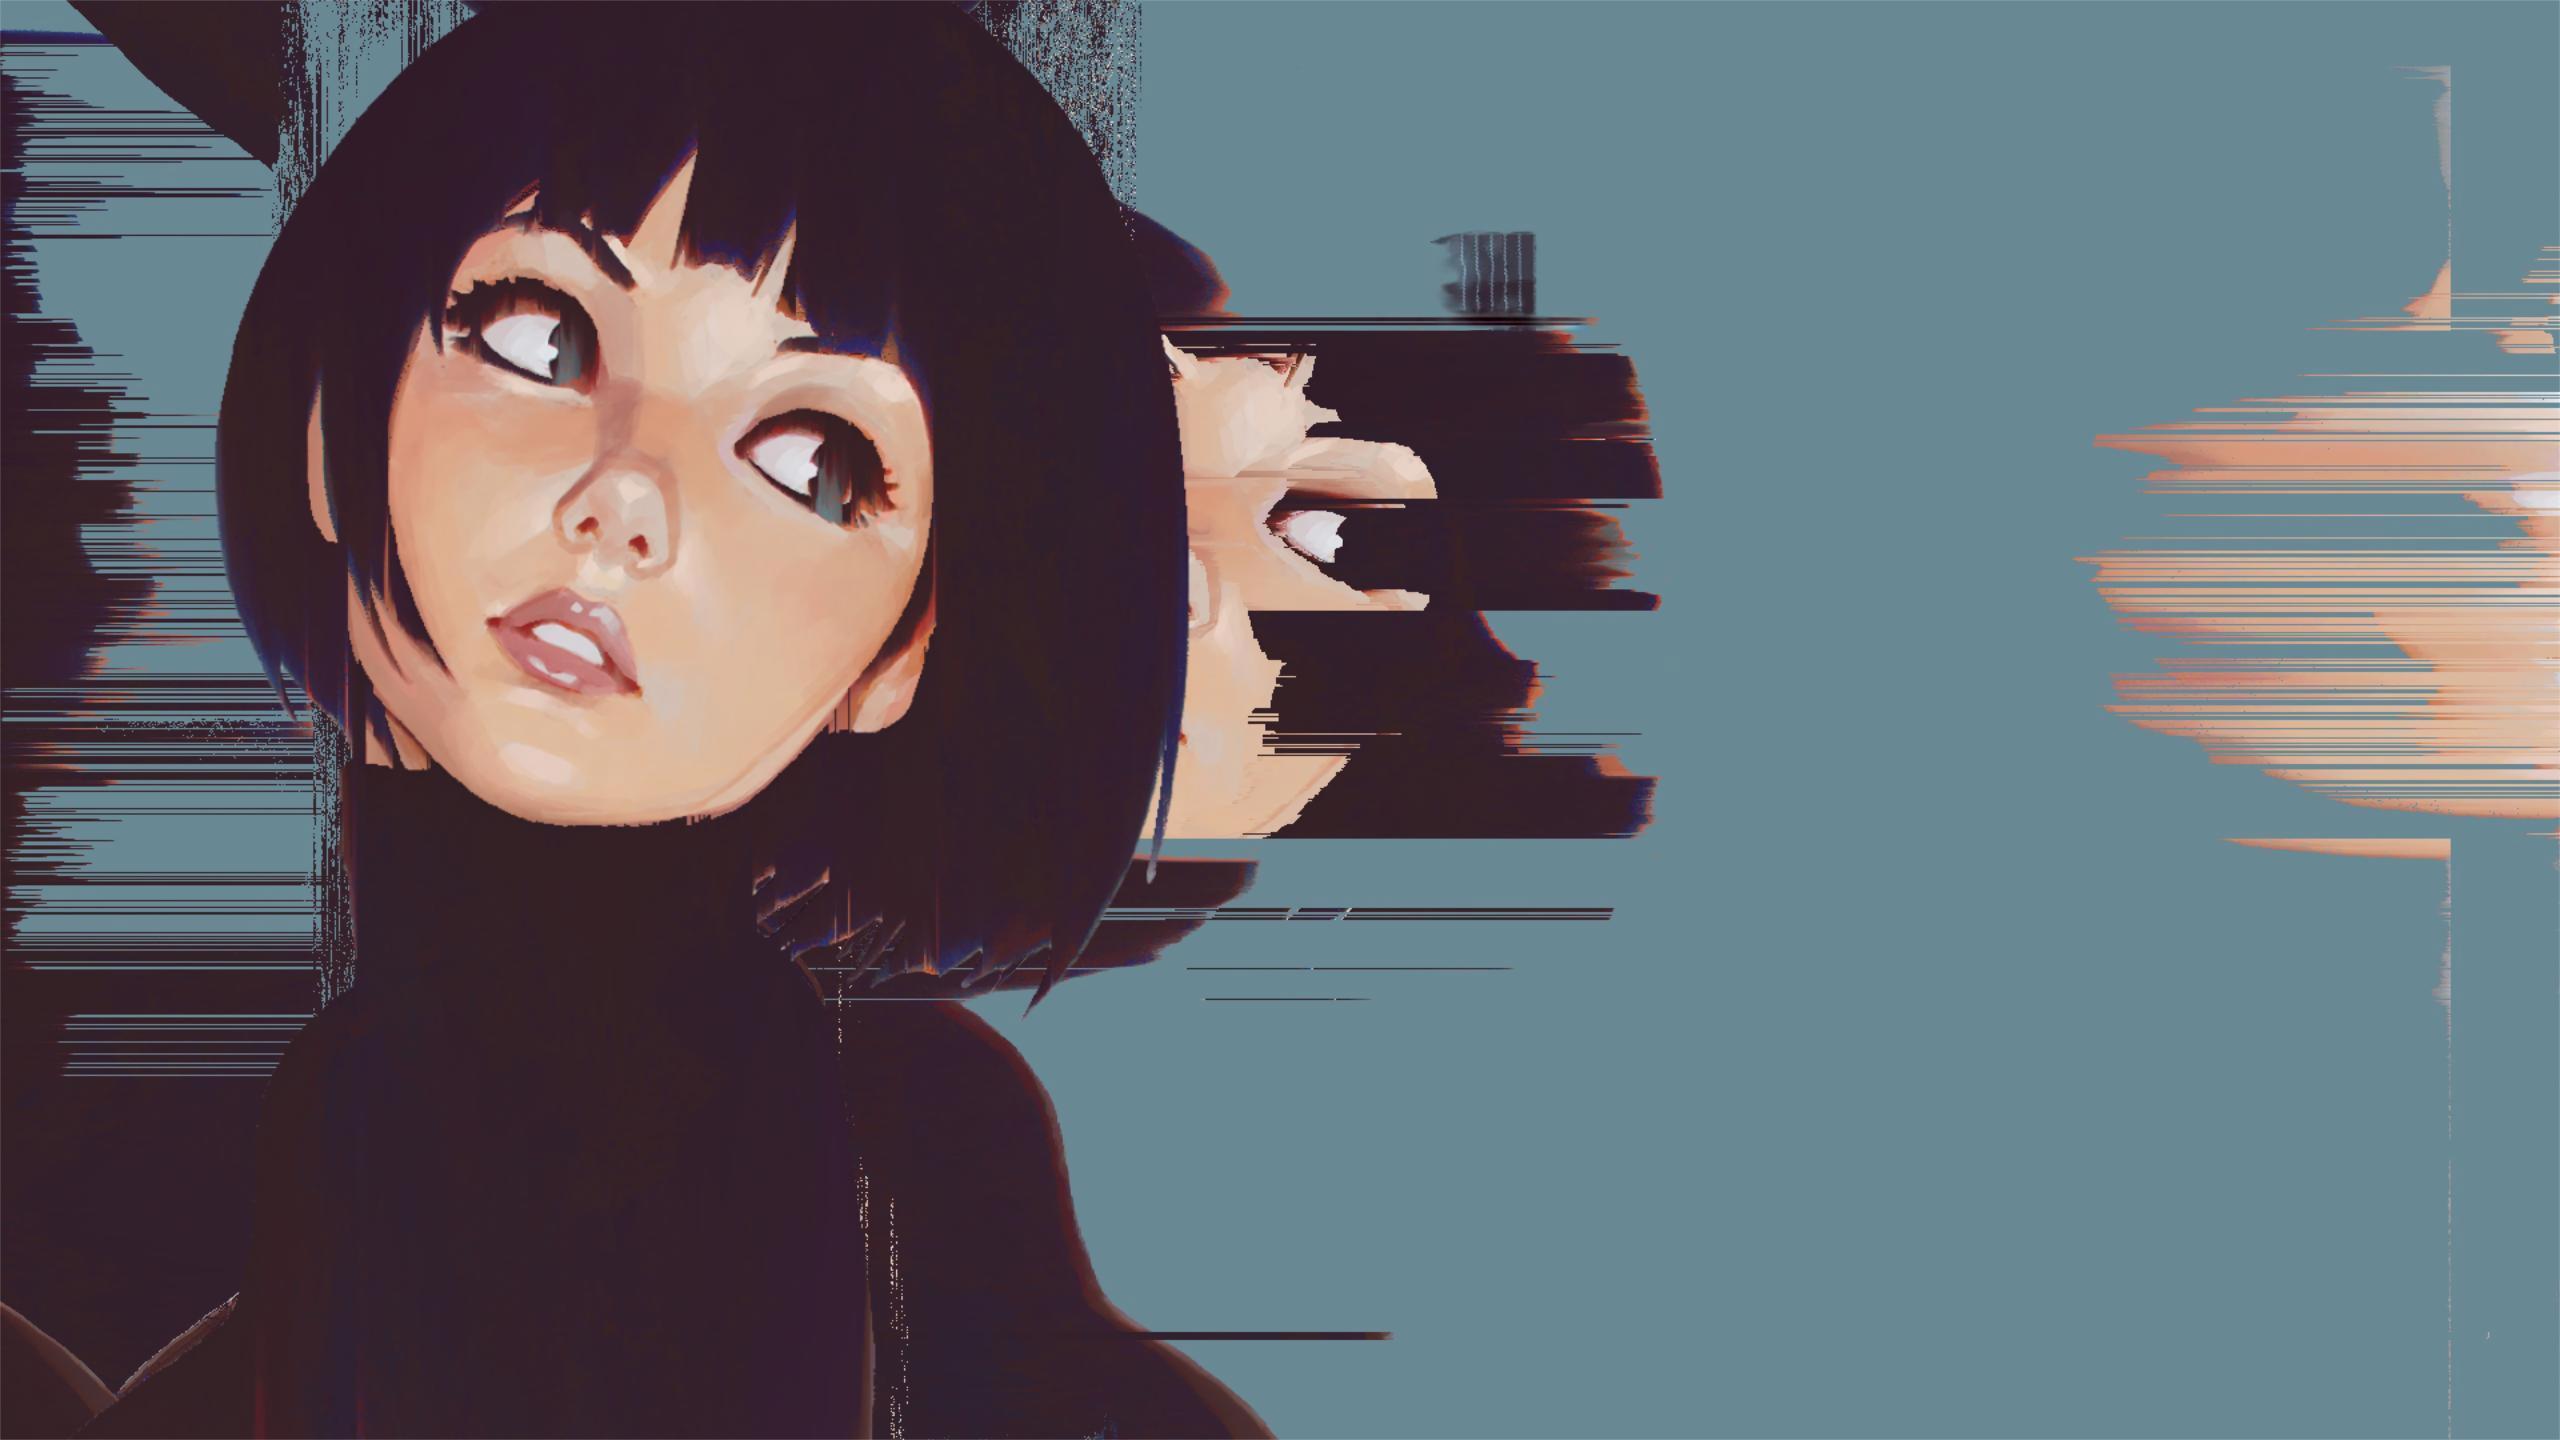 Hd Anime Girls Reddit Wallpapers Ilya Kuvshinov Glitch 2560x1440 Wallpaper Teahub Io 13 wallpaper anime reddit